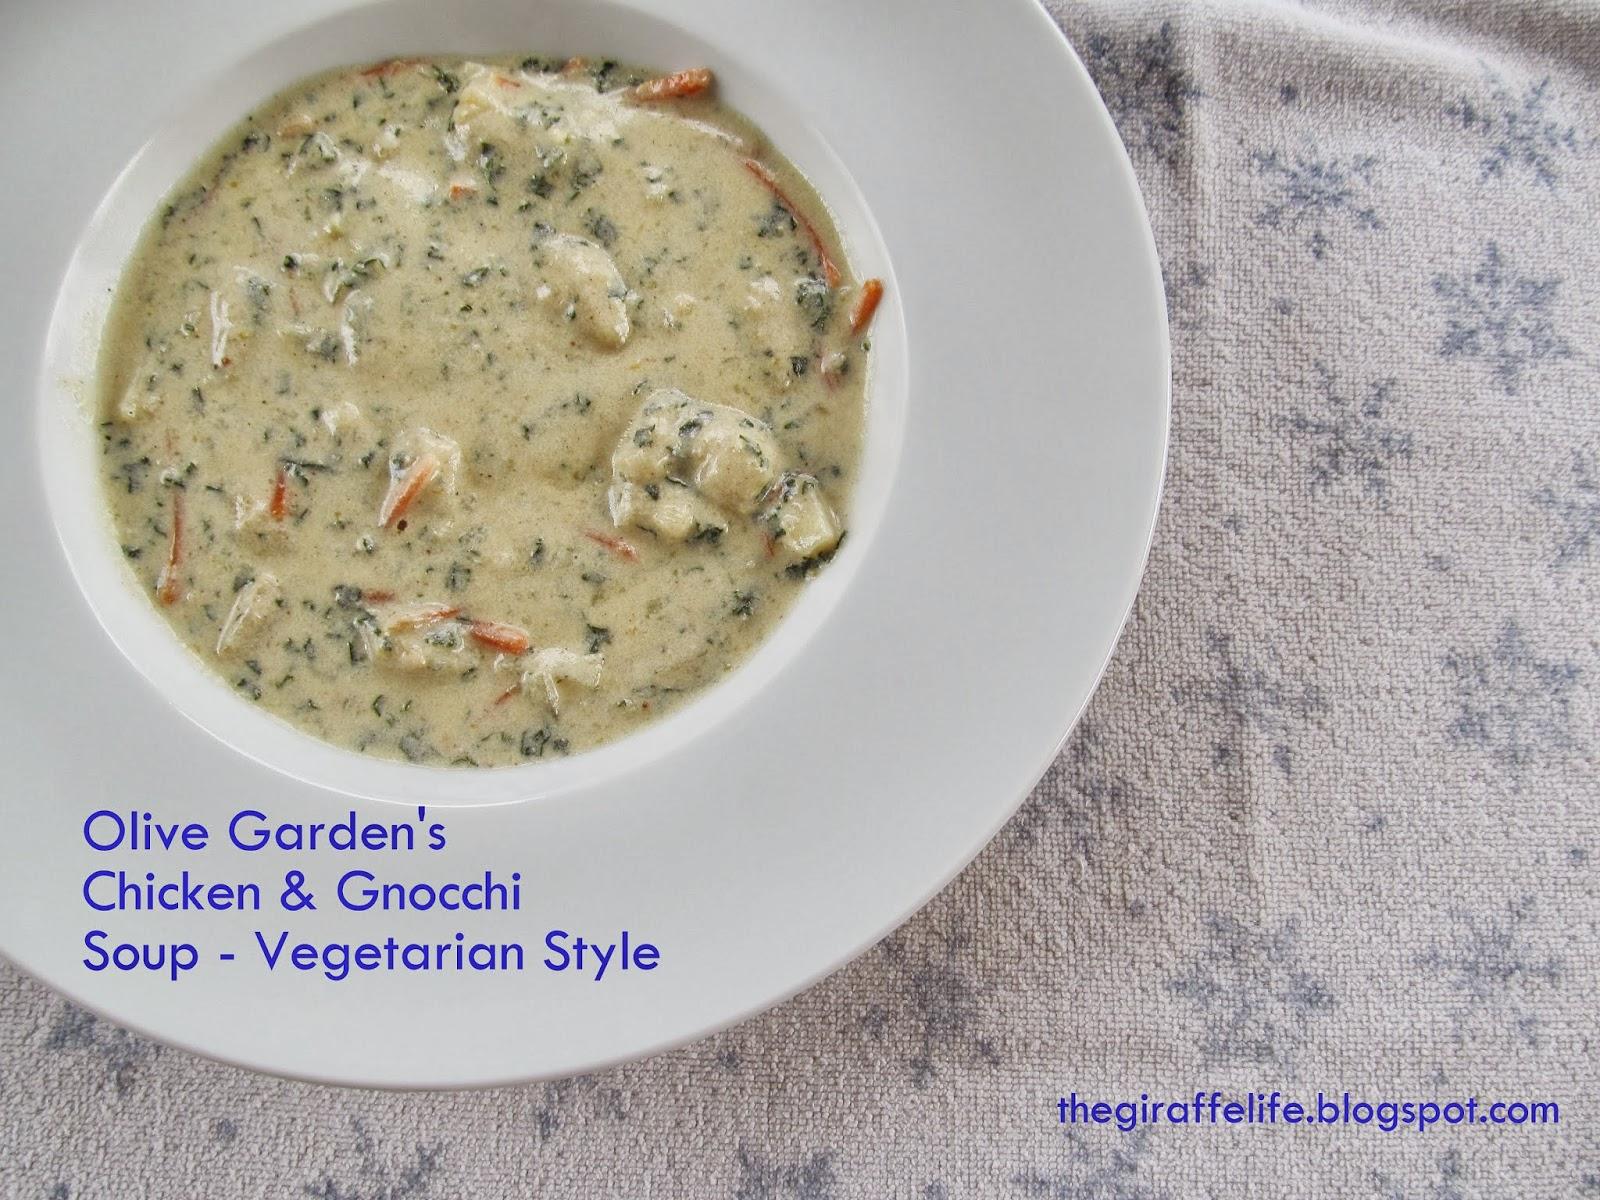 http://4.bp.blogspot.com/-YgJQO_fGQEo/UlrcutORhjI/AAAAAAAABlY/tKjcKo3wsUg/s1600/vegetarian+olive+garden%2527s+gnocchi+soup.JPG